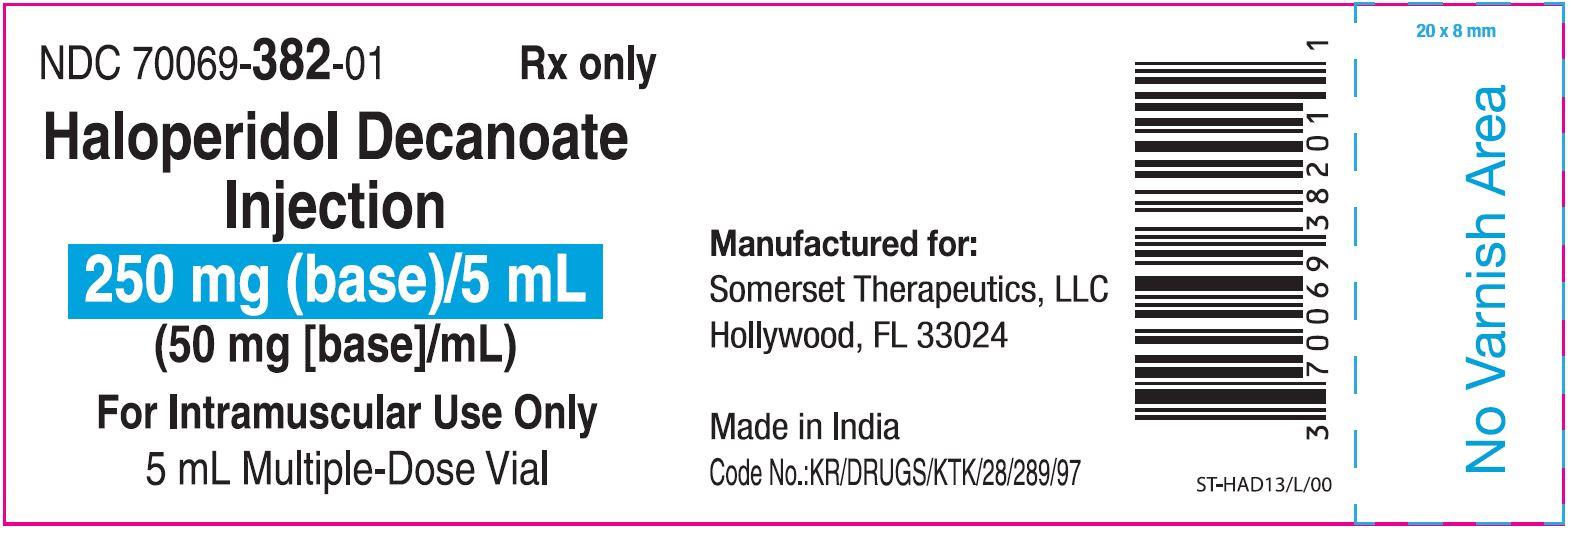 vial label 5ml